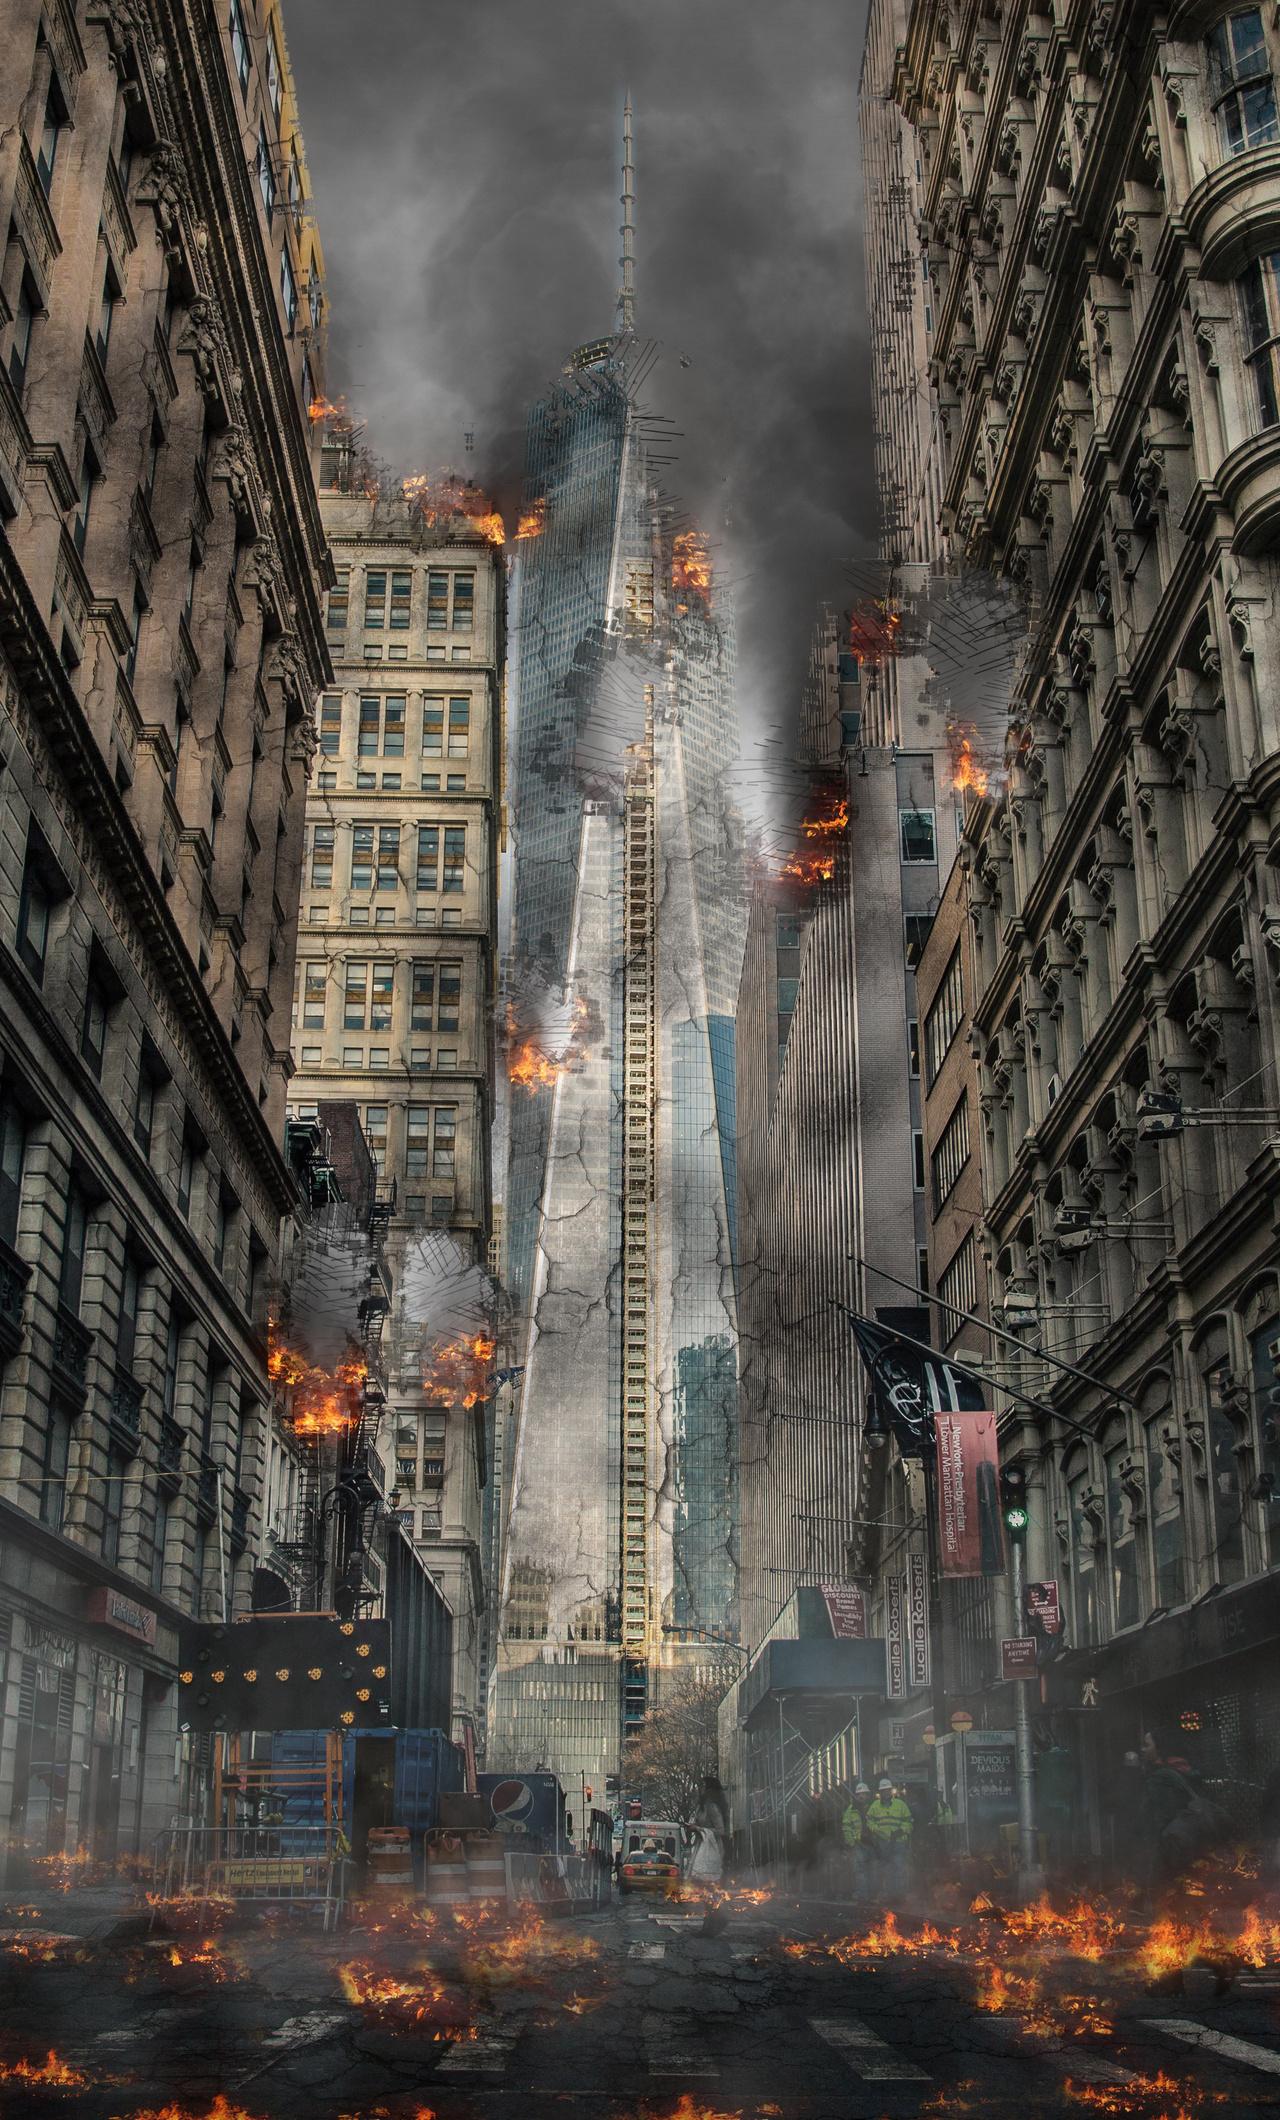 city-explosion-5k-zw.jpg